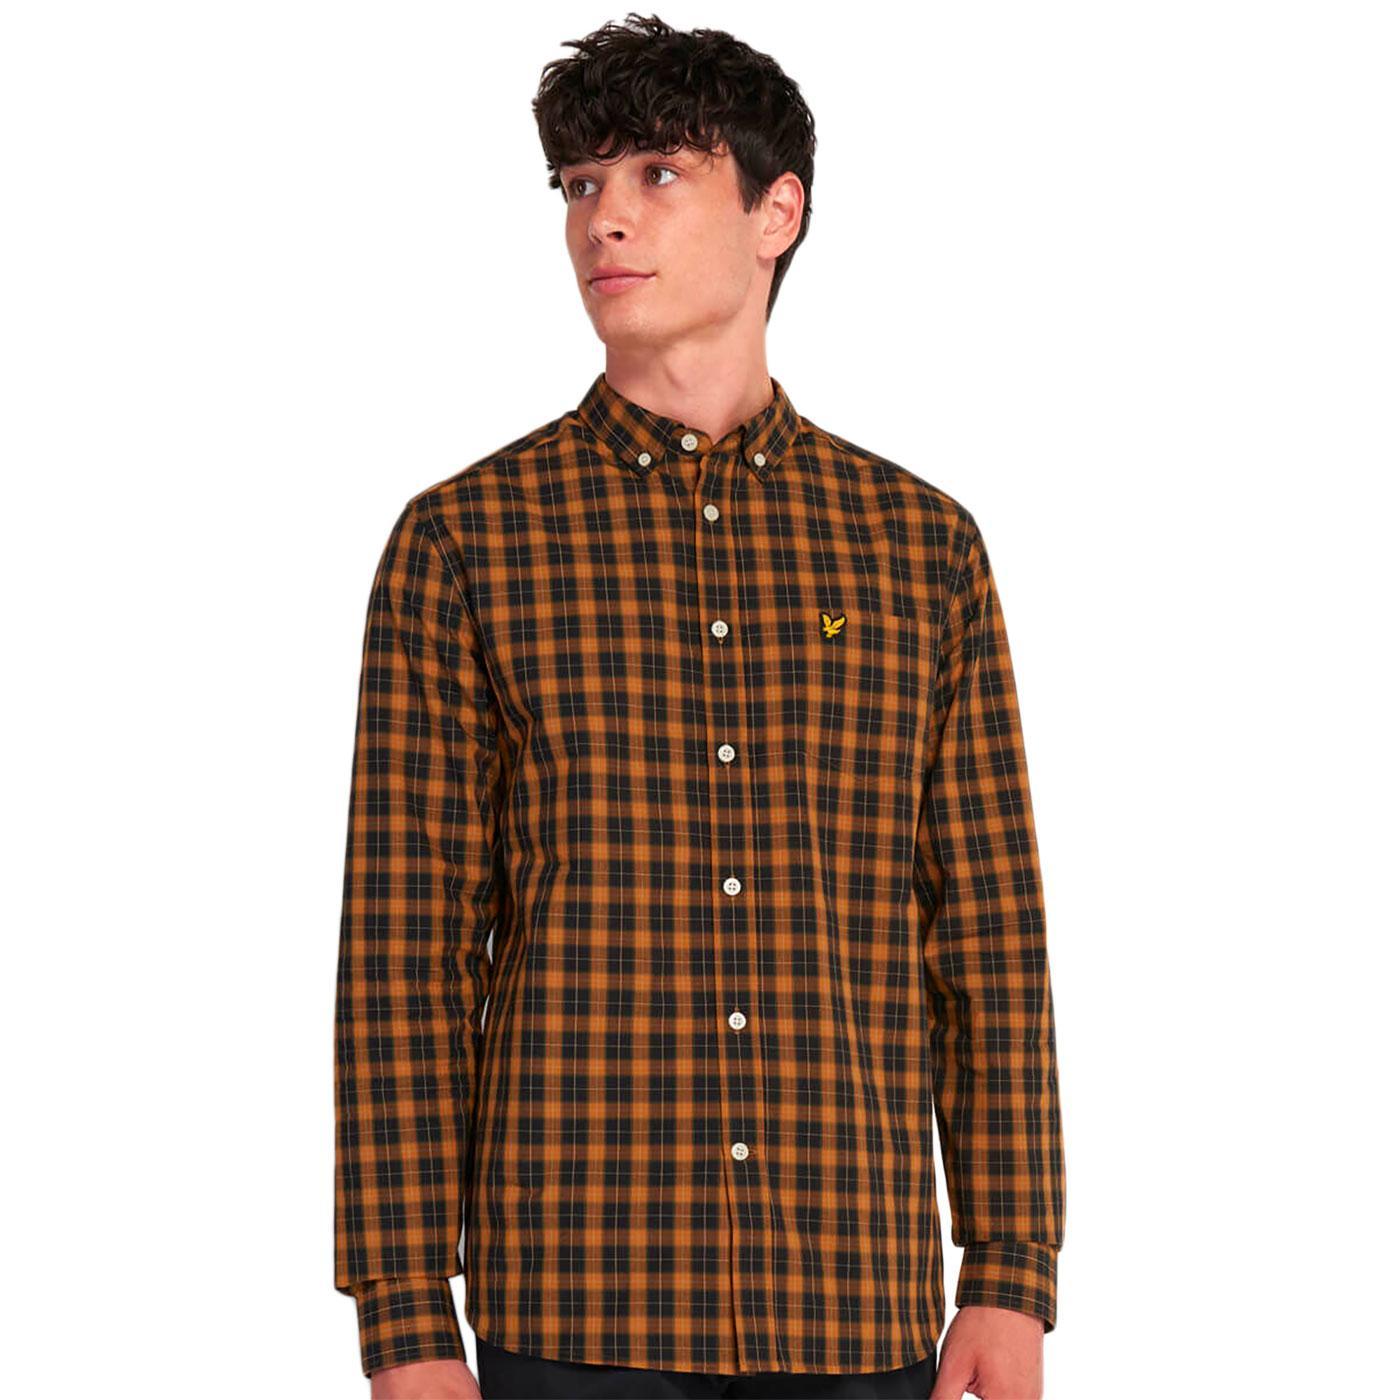 LYLE & SCOTT Retro Mod Tartan Shirt in Caramel